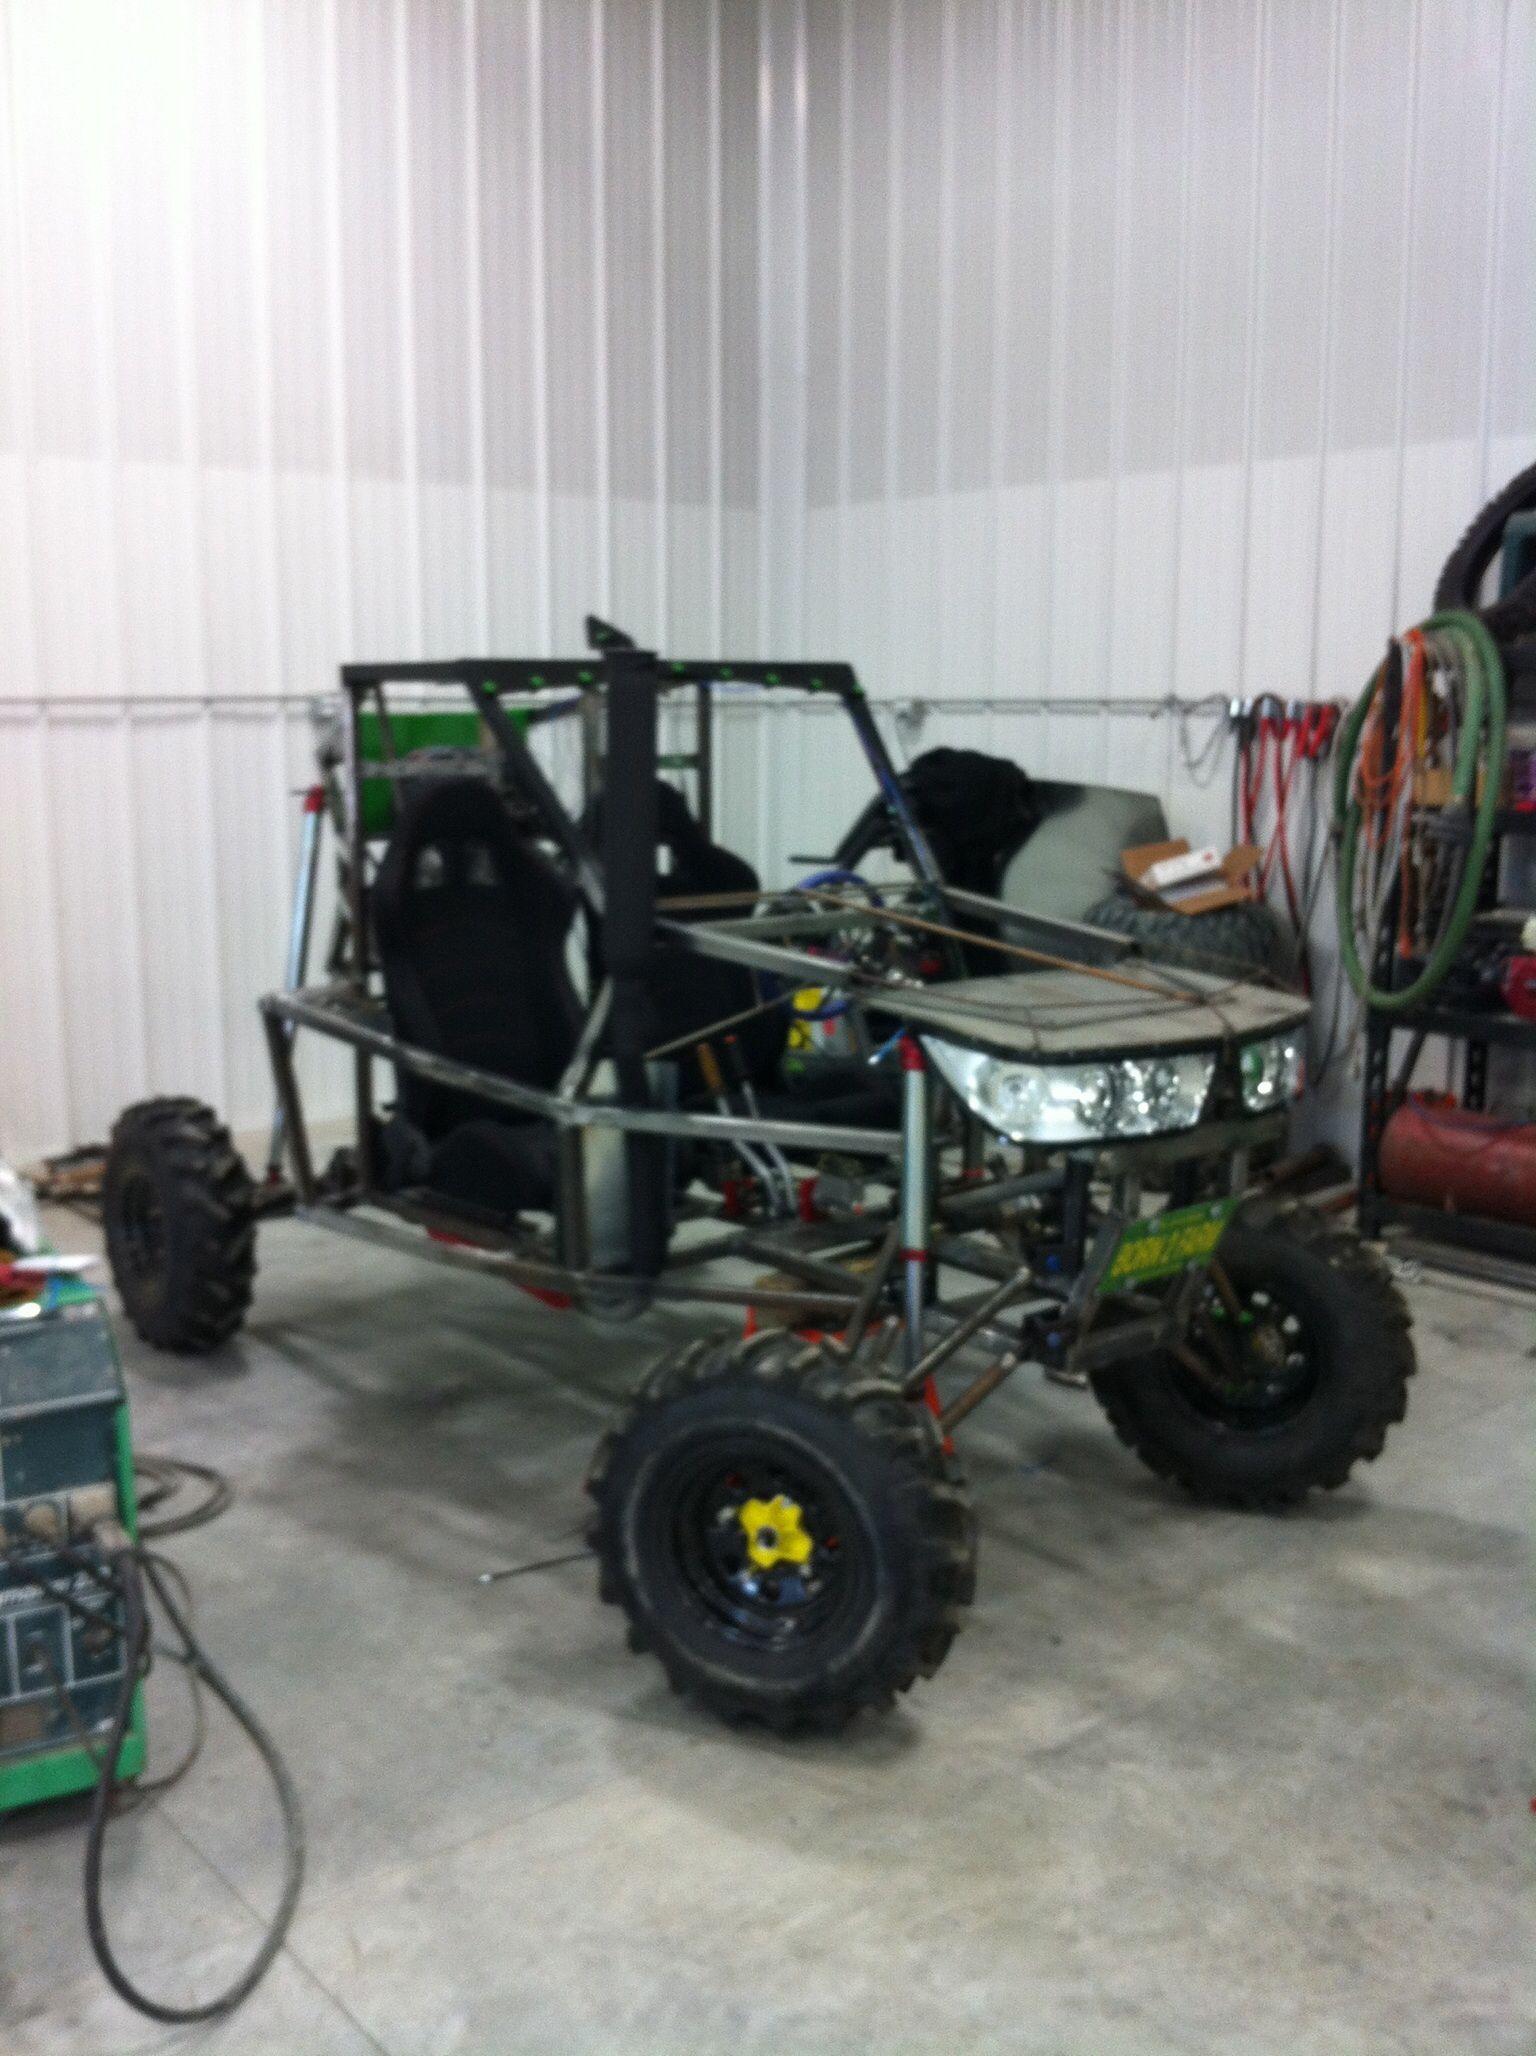 Tractor theme Mini sand rail | Mini buggy/ sand rail | Sand